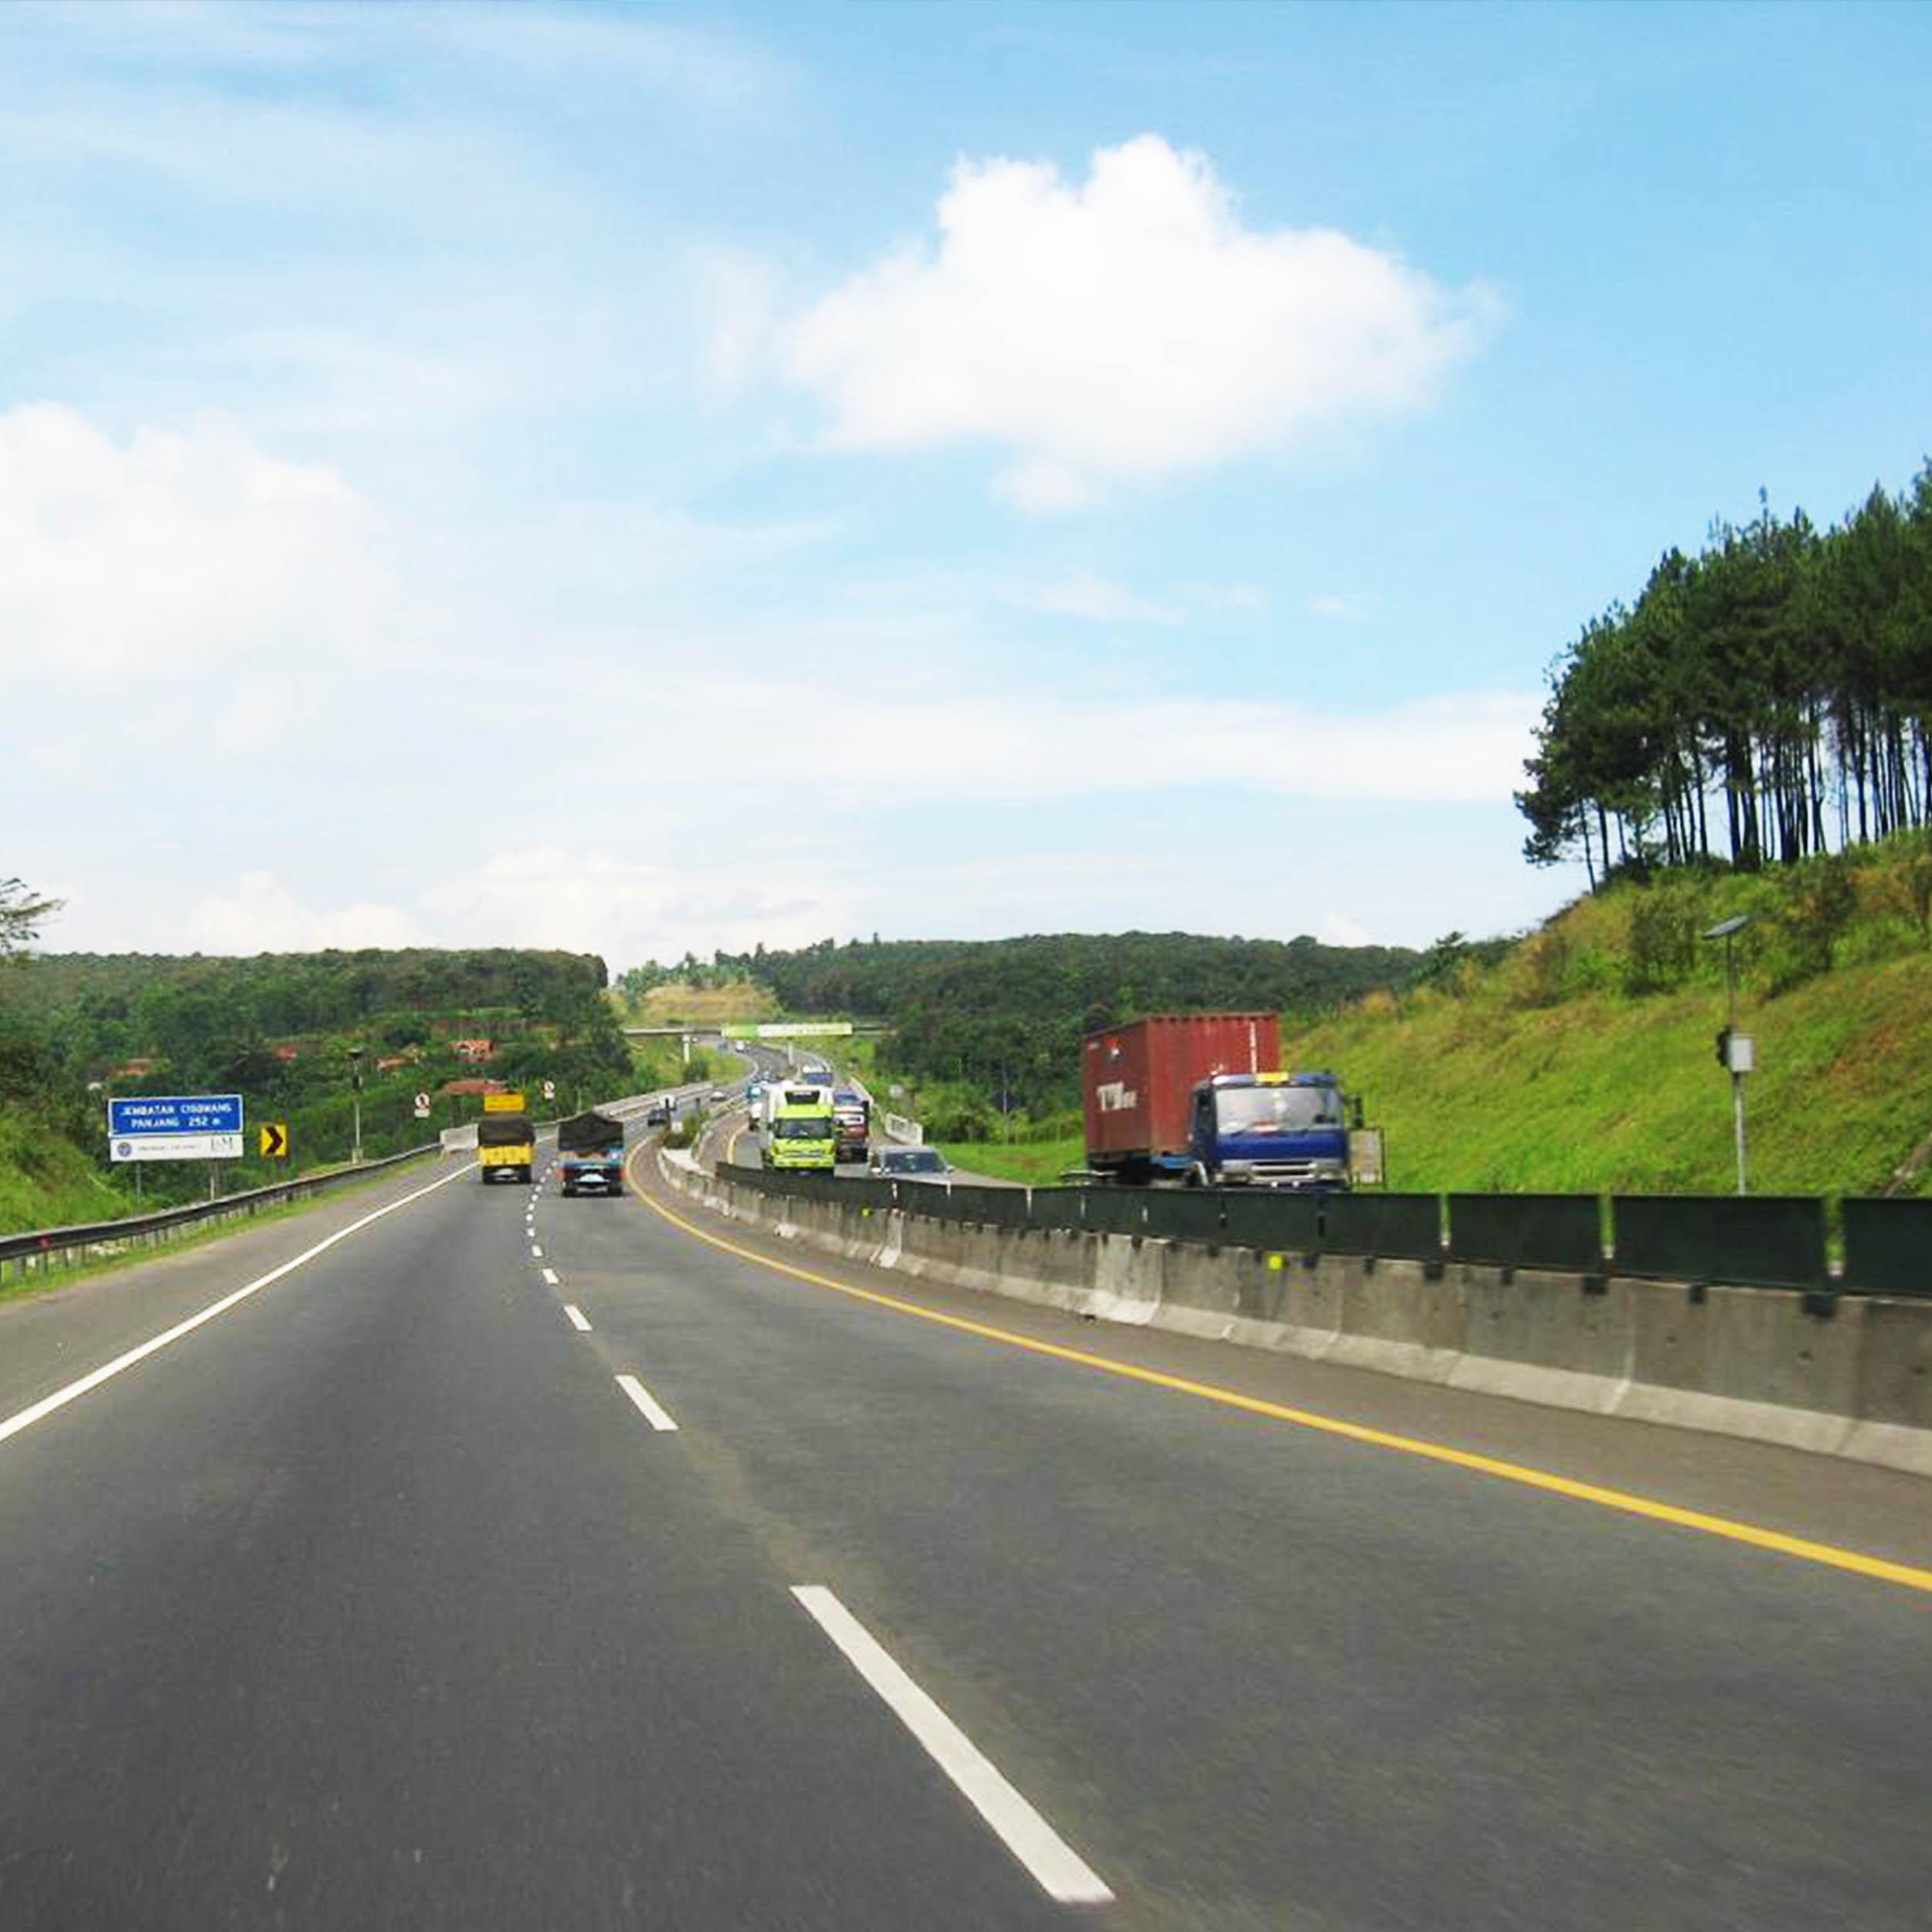 Skema Contraflow di Tol Cipularang Akankah Dapat Mengurai Kemacetan?